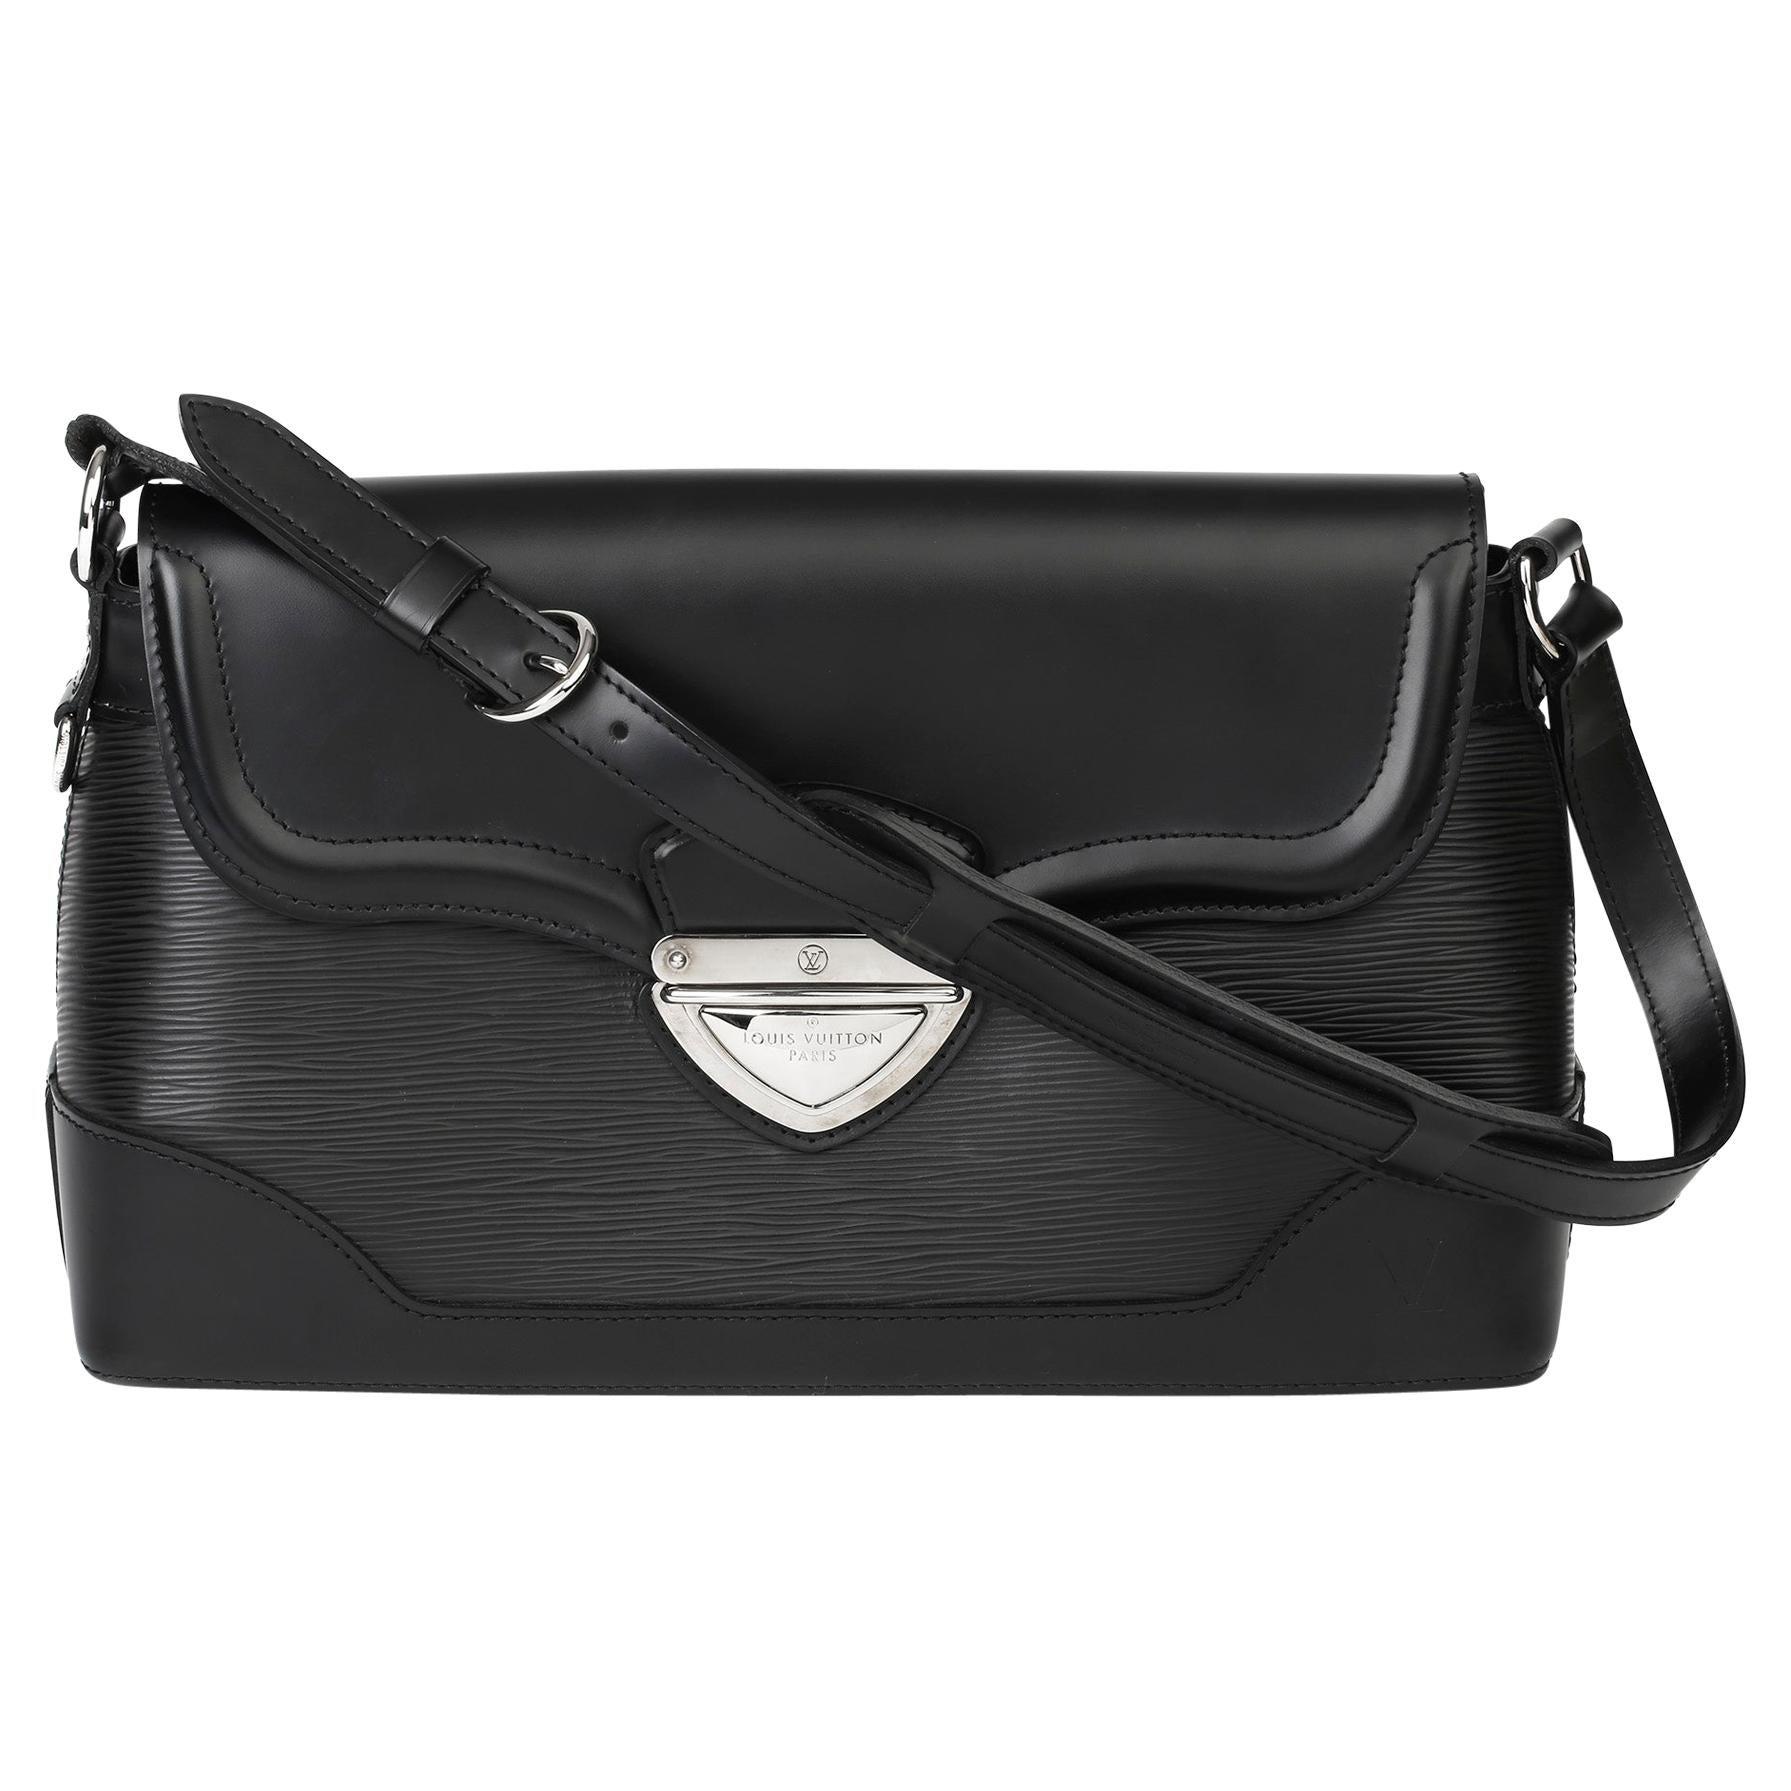 2009 Louis Vuitton Black Epi Leather & Black Calfskin Leather Beverly Bag